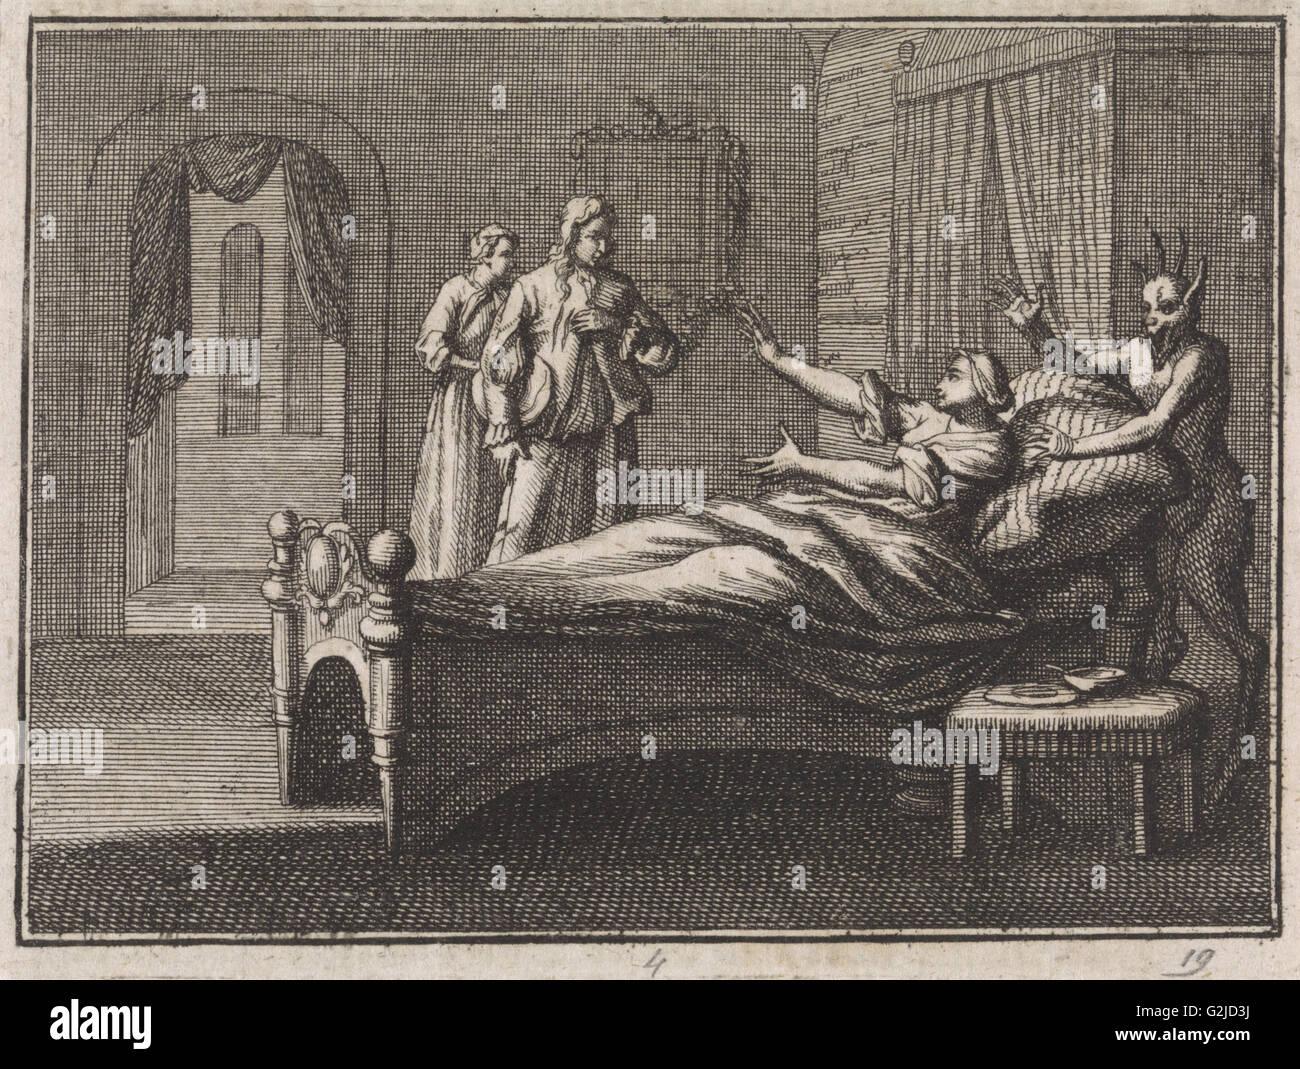 Malata riceve la sua amante, Caspar Luyken, Christoph Weigel, 1704 Immagini Stock